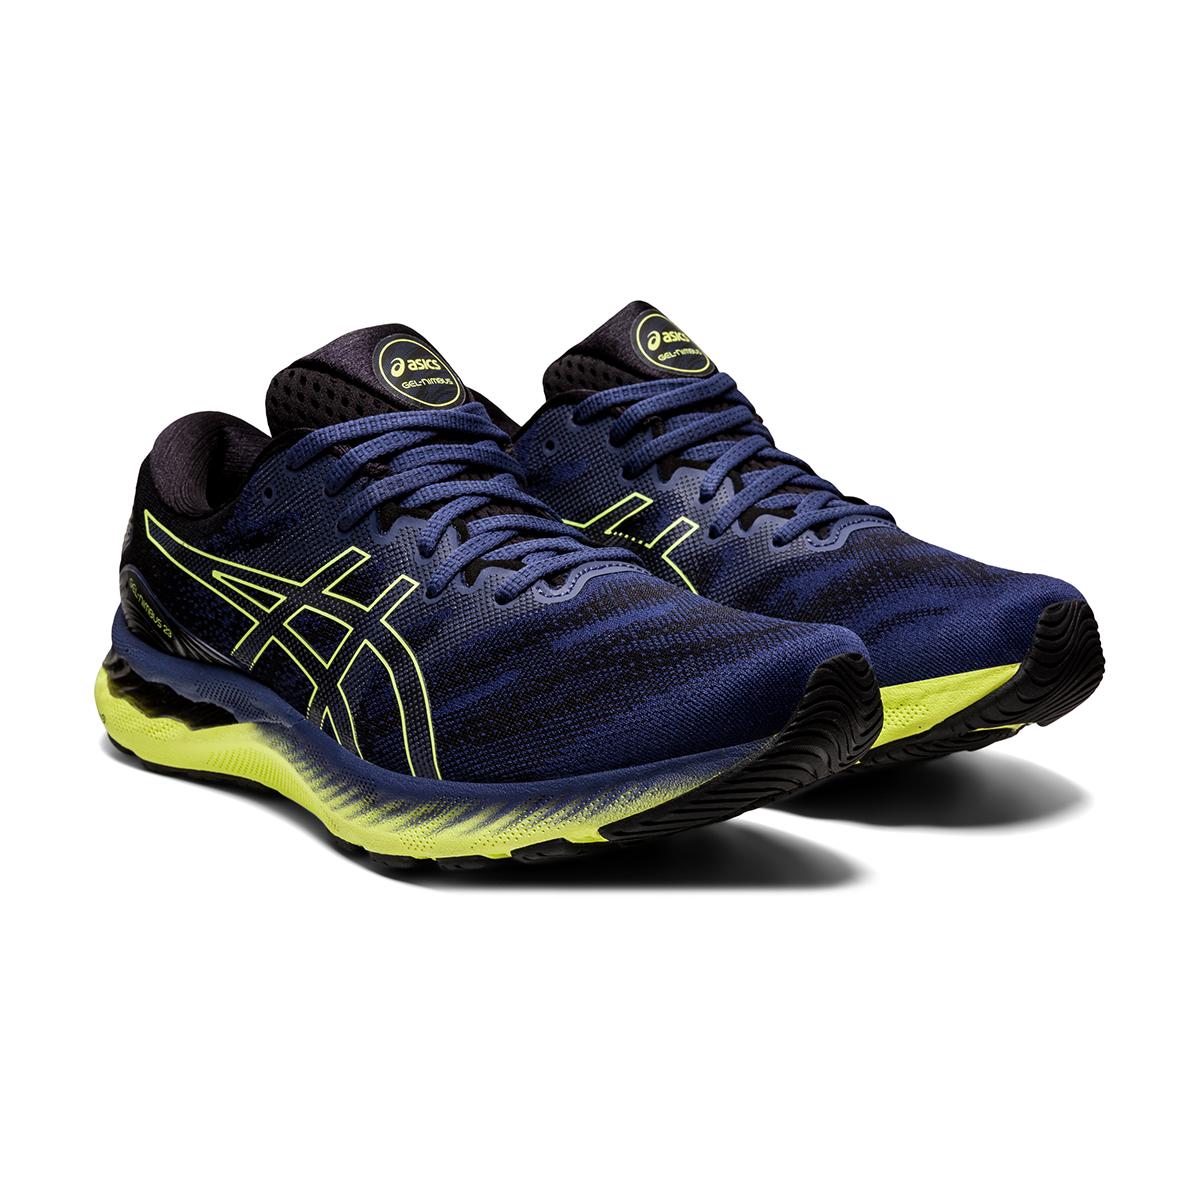 Men's Asics Gel-Nimbus 23 Running Shoe - Color: Thunder Blue - Size: 7 - Width: Regular, Thunder Blue, large, image 3